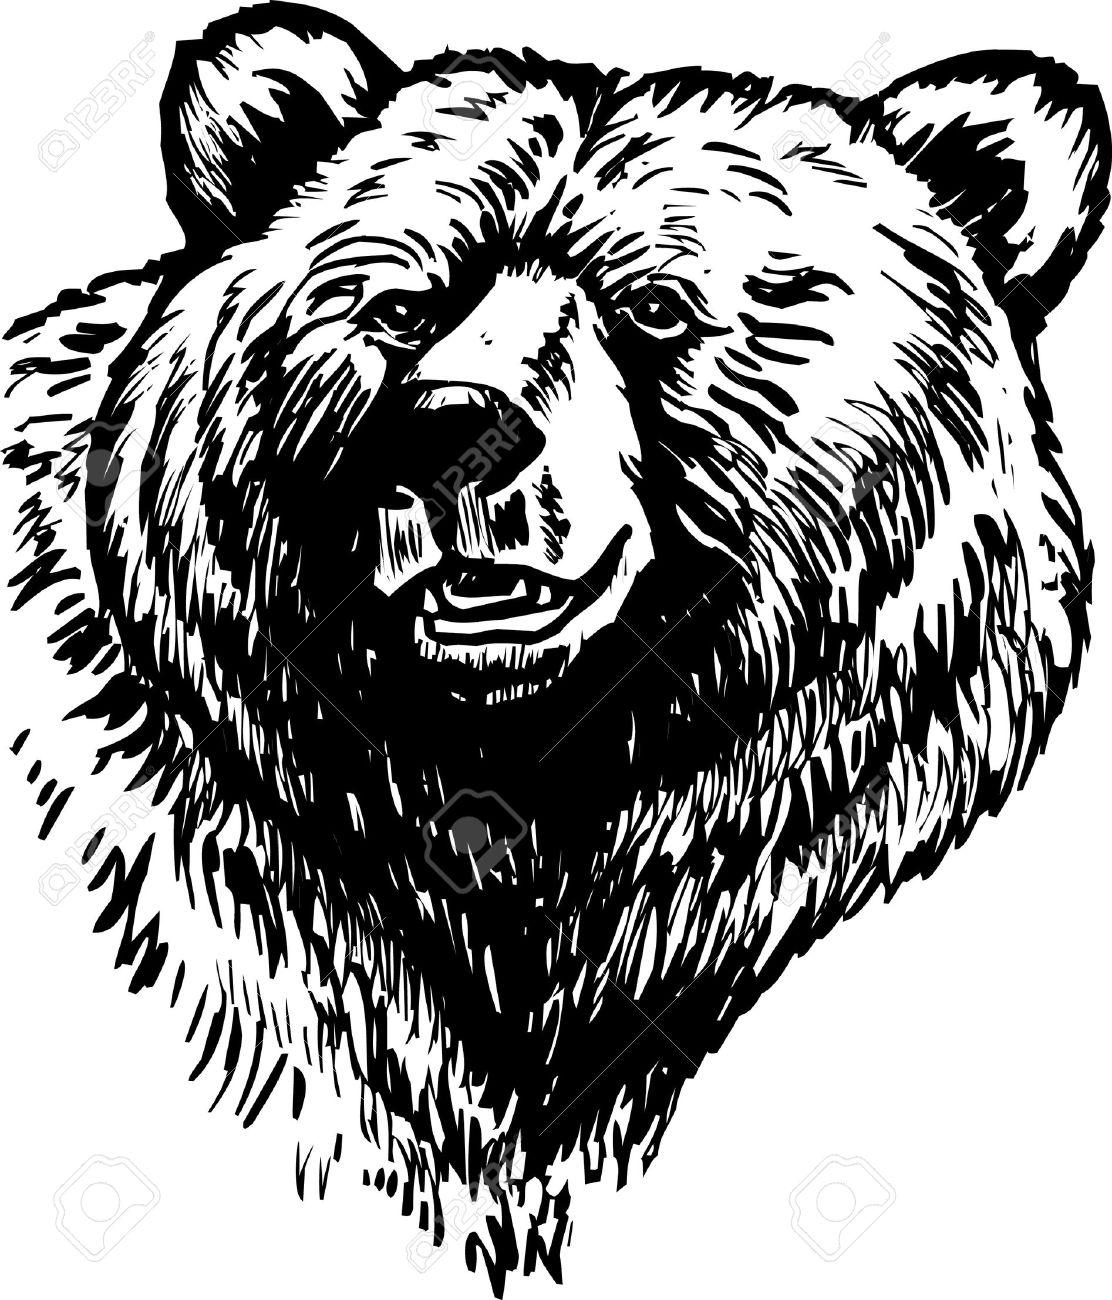 Grizzly Brown Bear Vector Stock Vector - 6122300